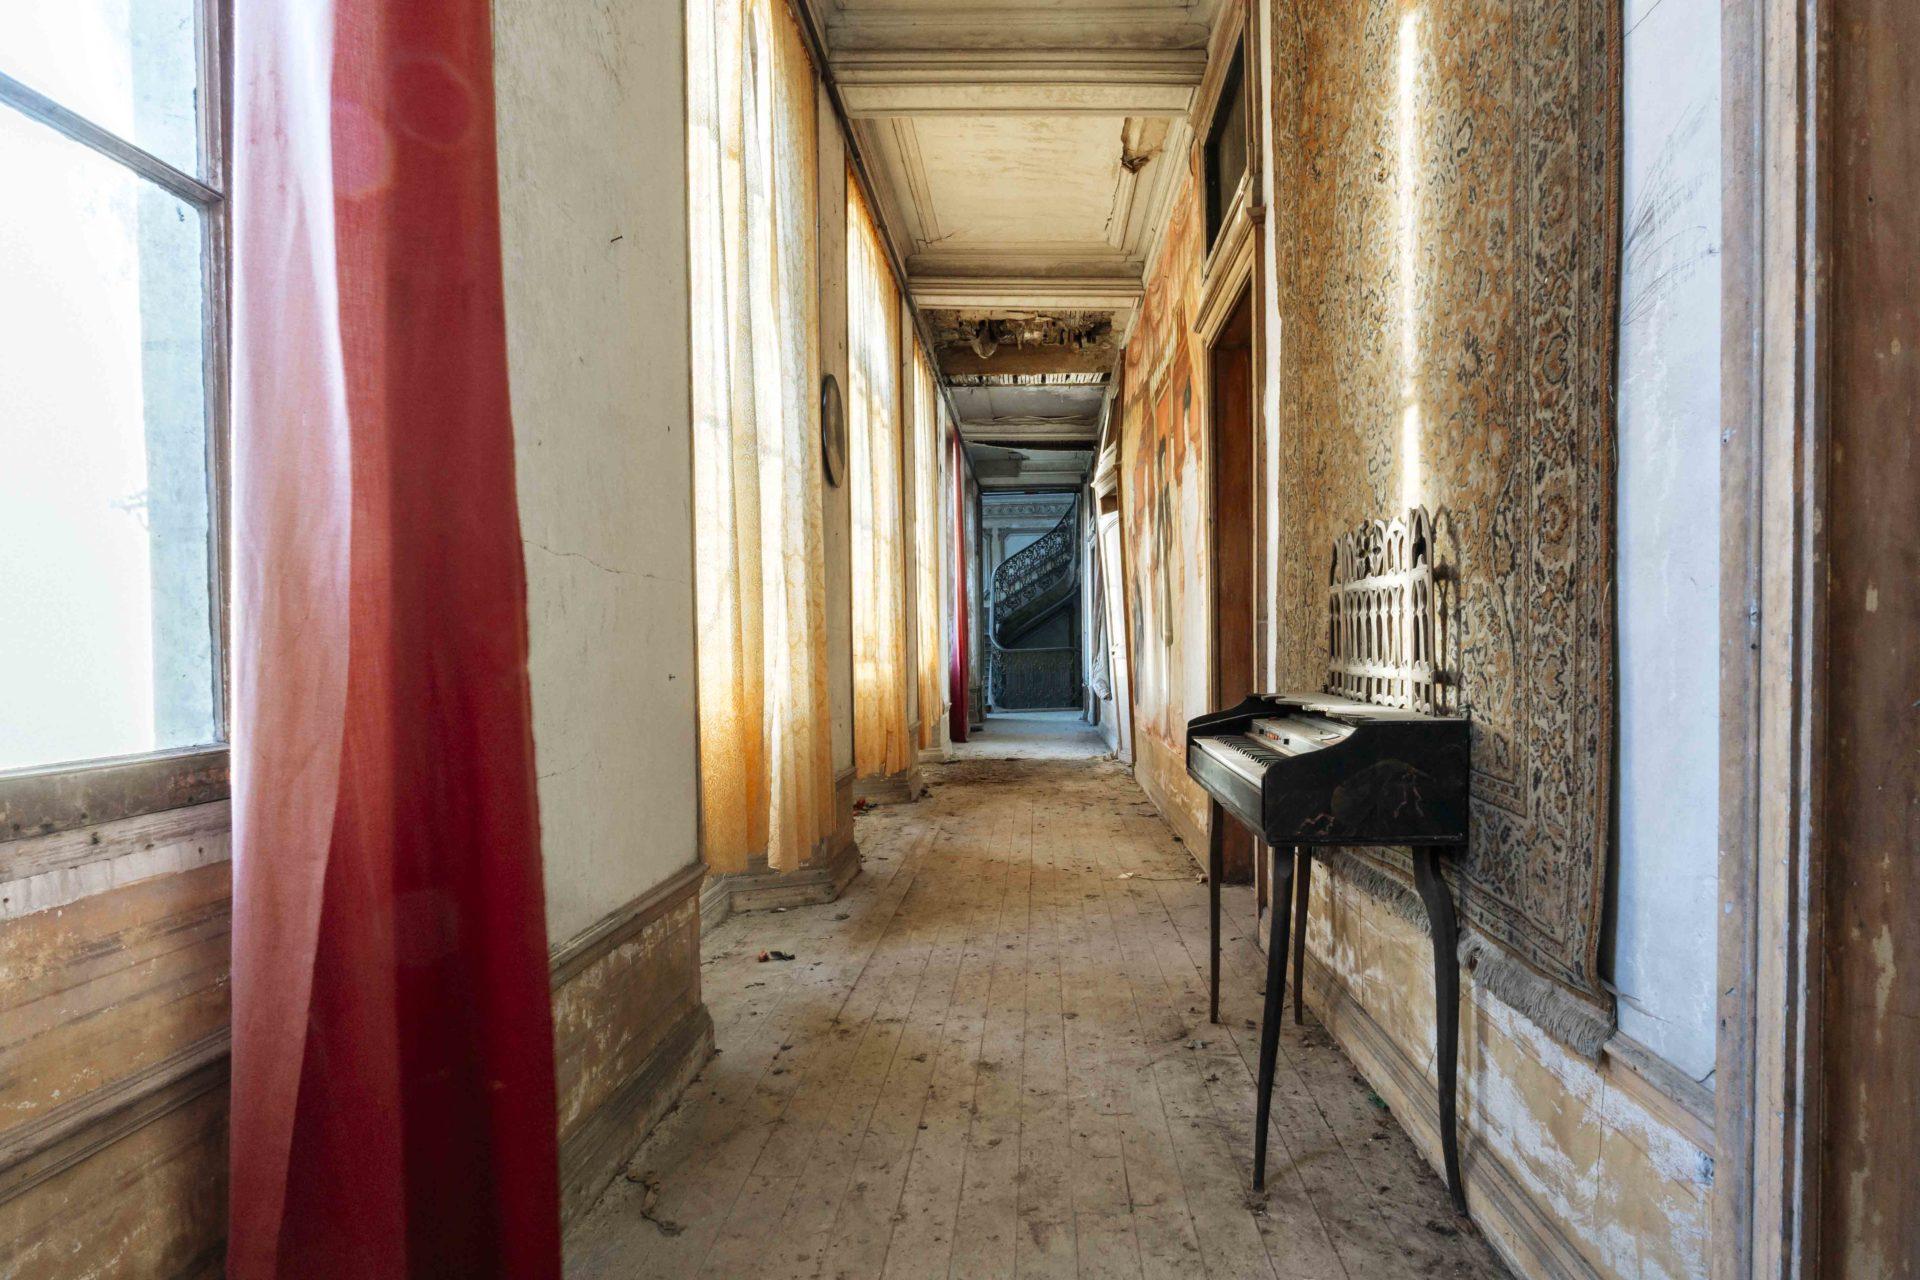 Requiem pour pianos 49 | Serie Requiem pour pianos | Romain Thiery | France